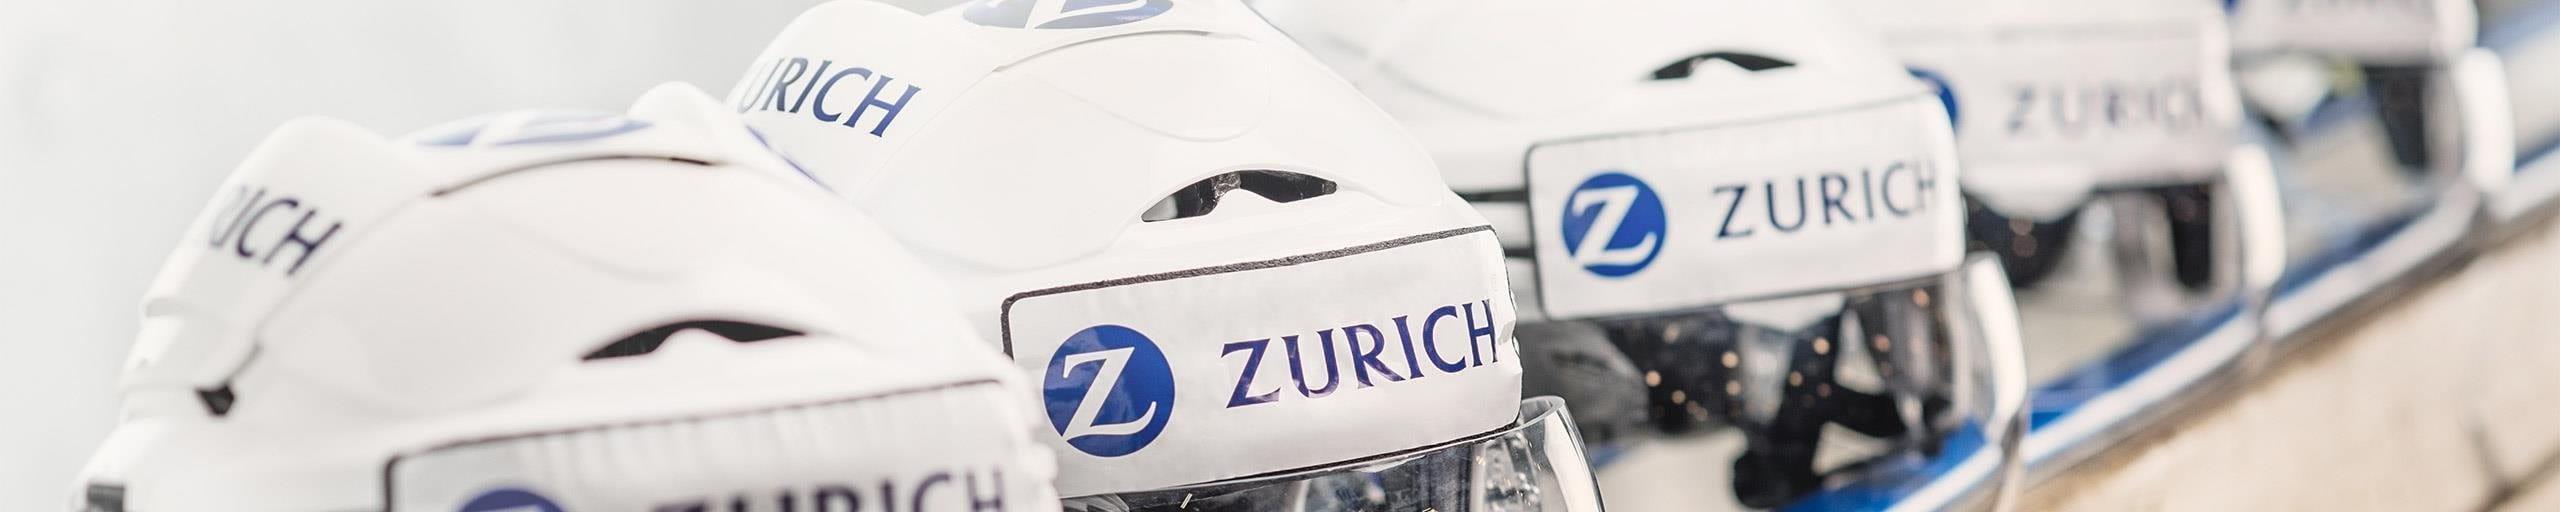 Indemnity Insurance Warranty And Indemnity Insurance Zurich